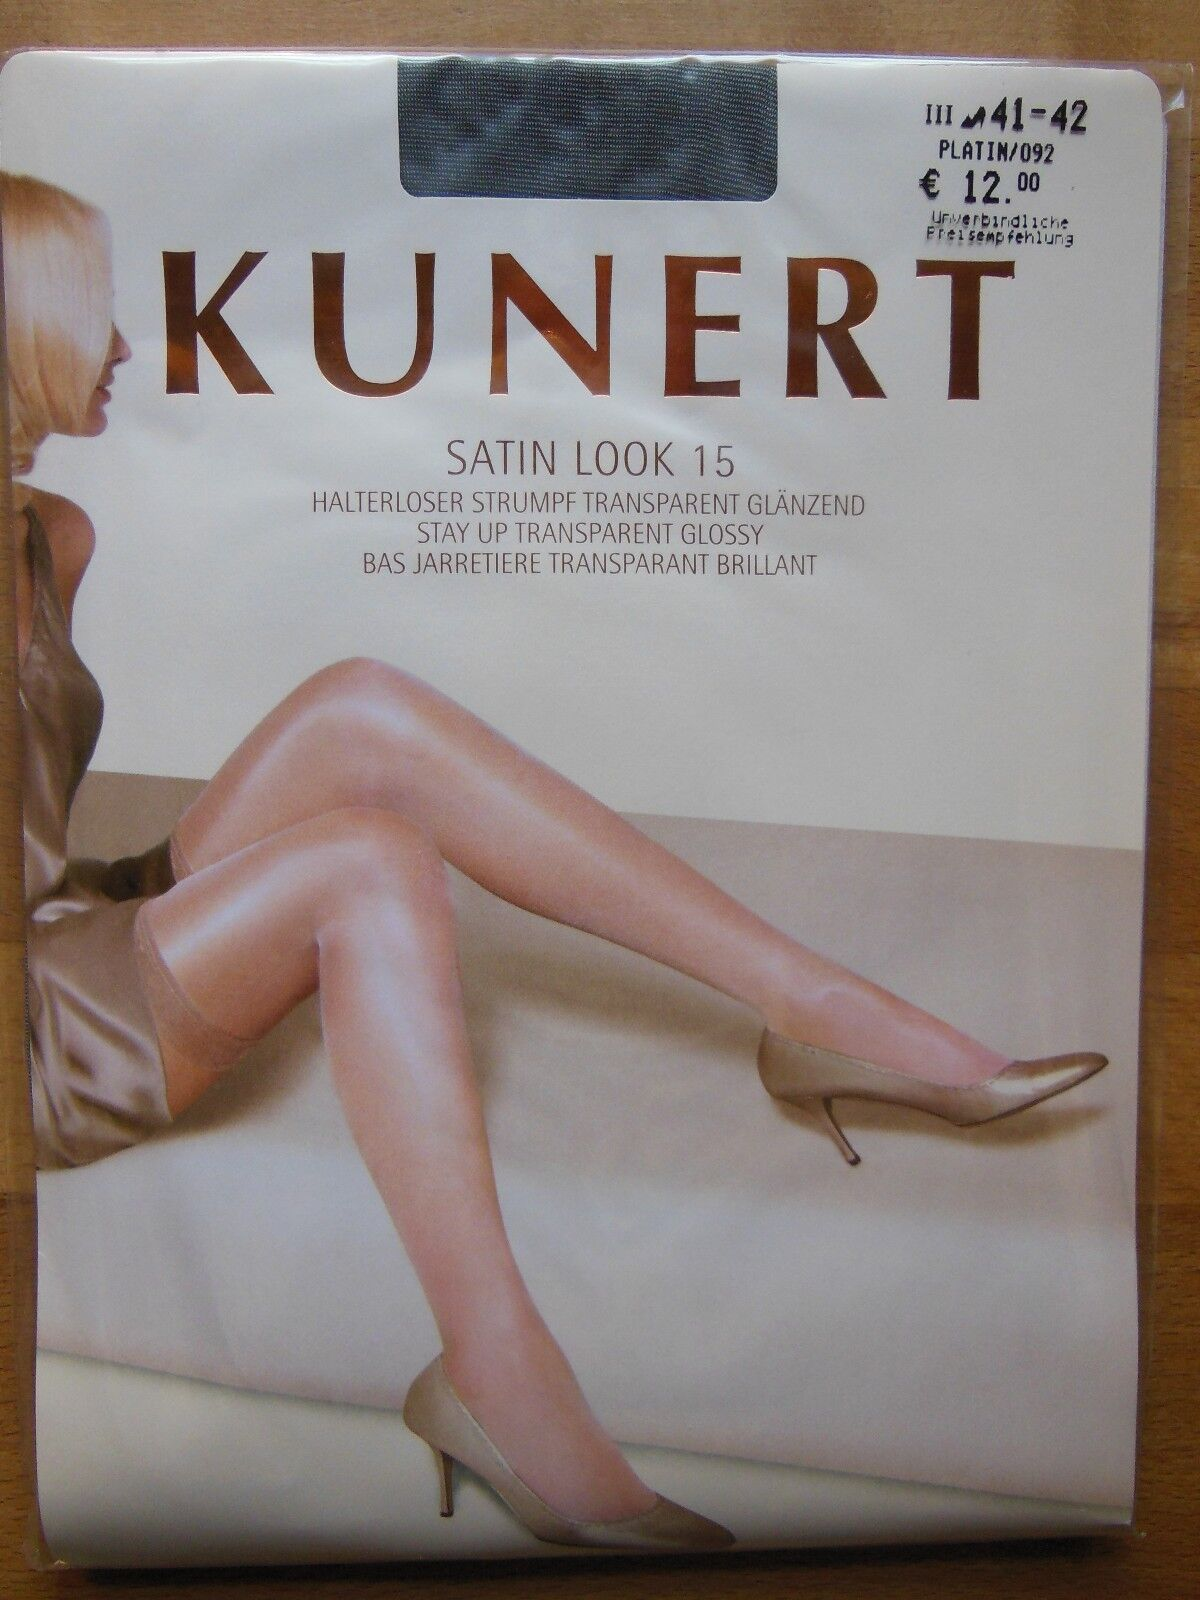 Kunerl satin halterlose bas satin Kunerl look 15 la. brillant taille 35-37 platine 092 b90585